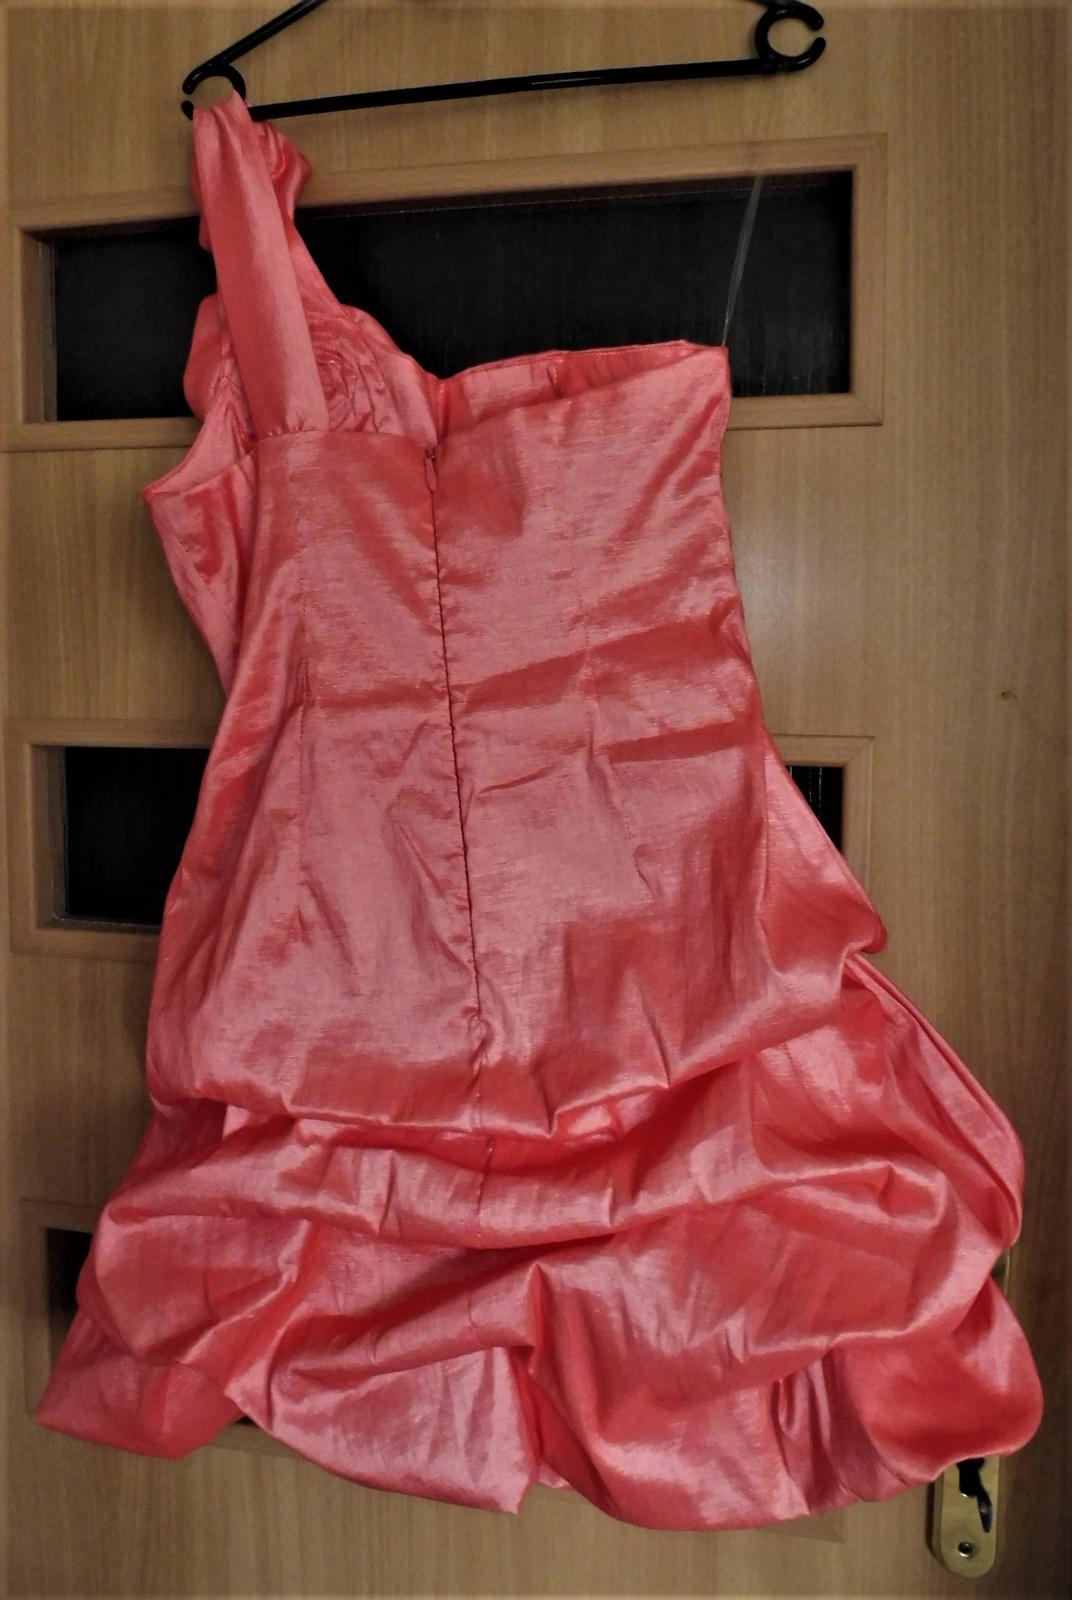 elstické šaty vel.40 - Obrázek č. 4